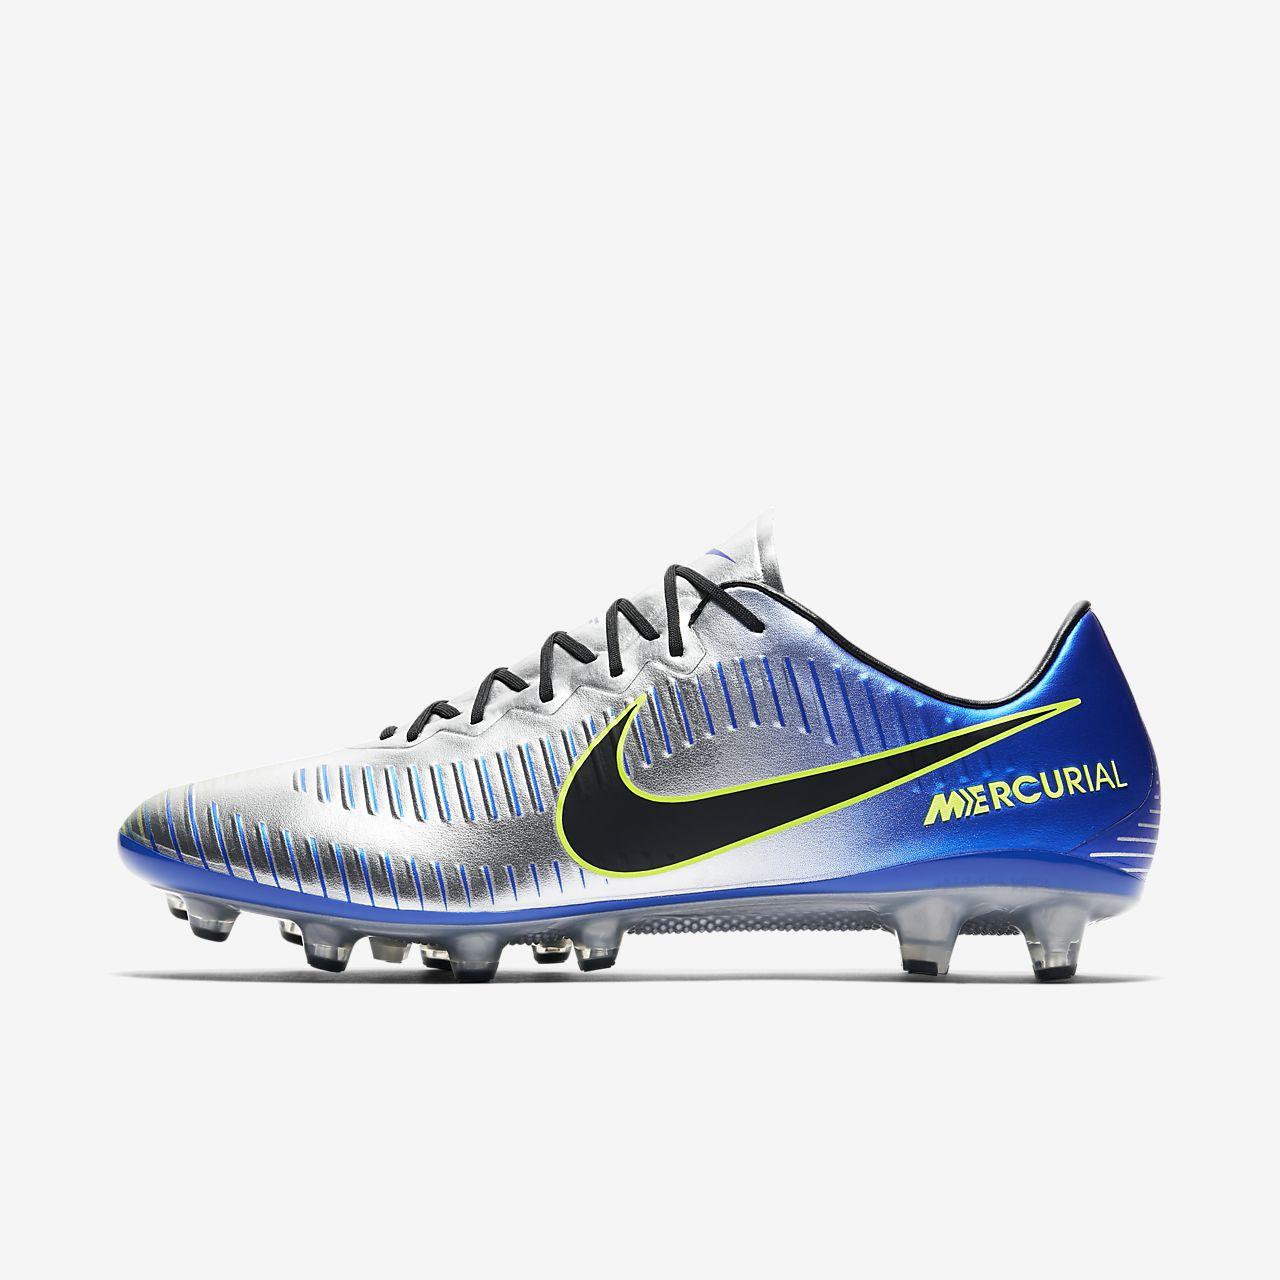 Mercurial Vapor  AG Nike mens mercurial vapor xi black purplelogo artificialgrass Football Boots Outlets